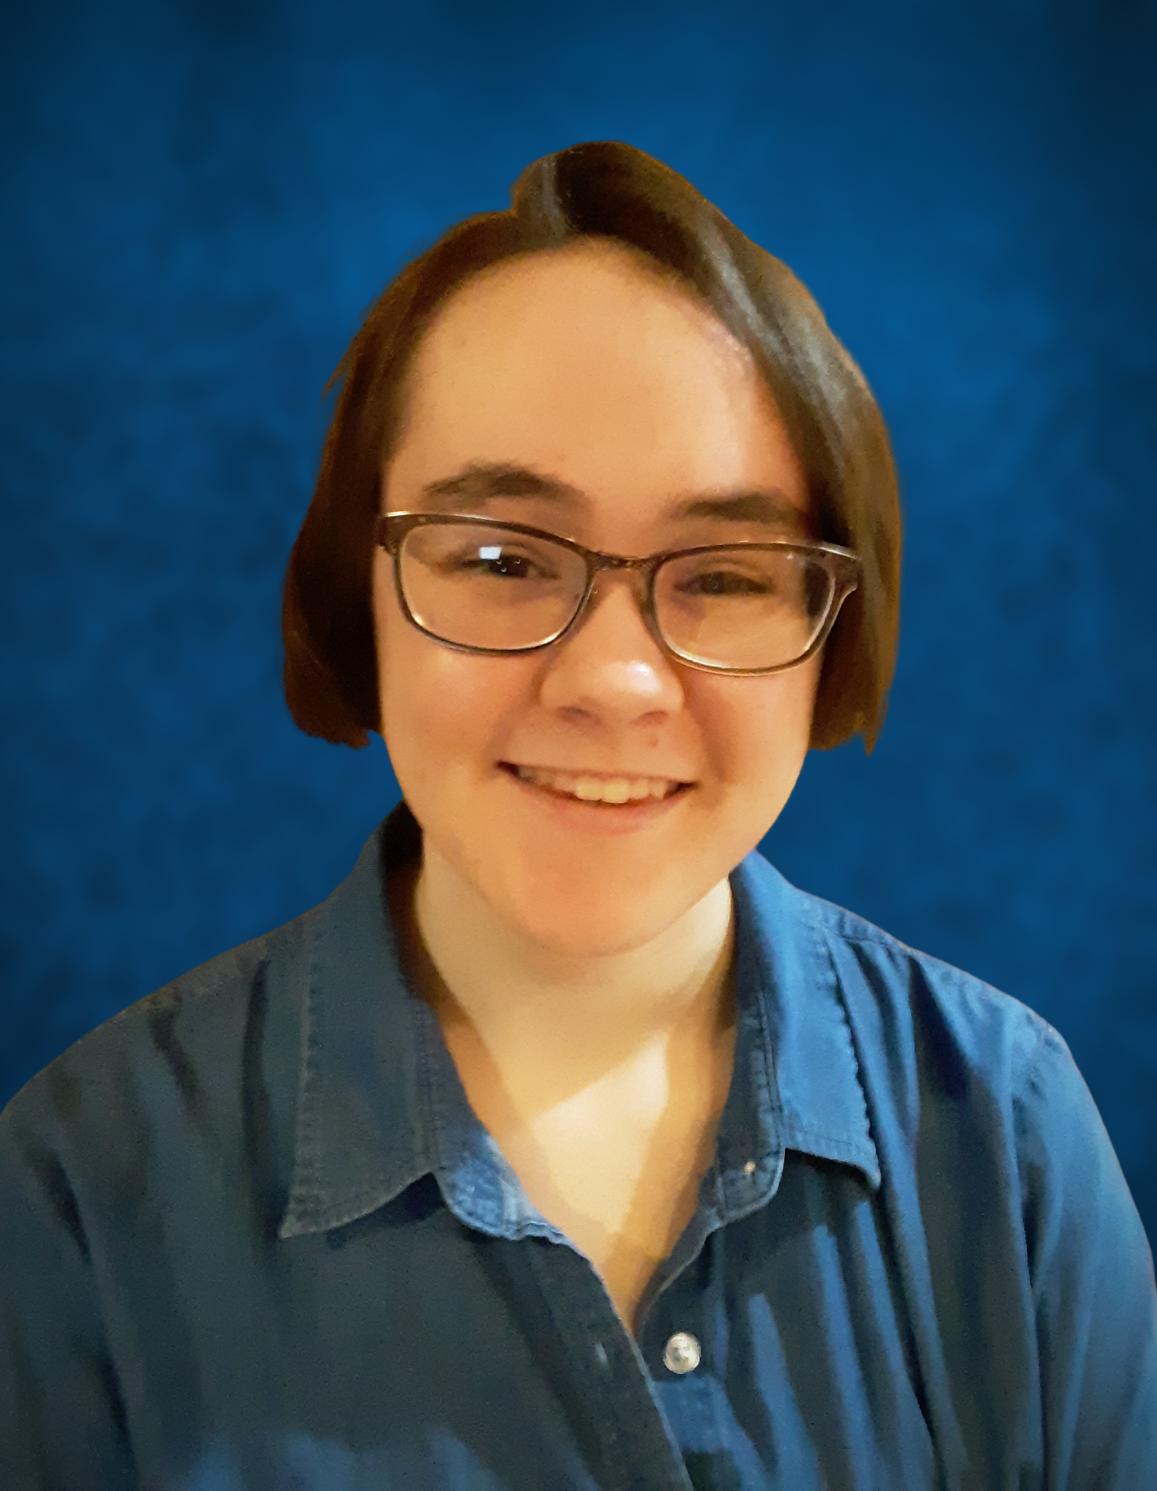 Picture of Kyra Hess, Scholarship Winner